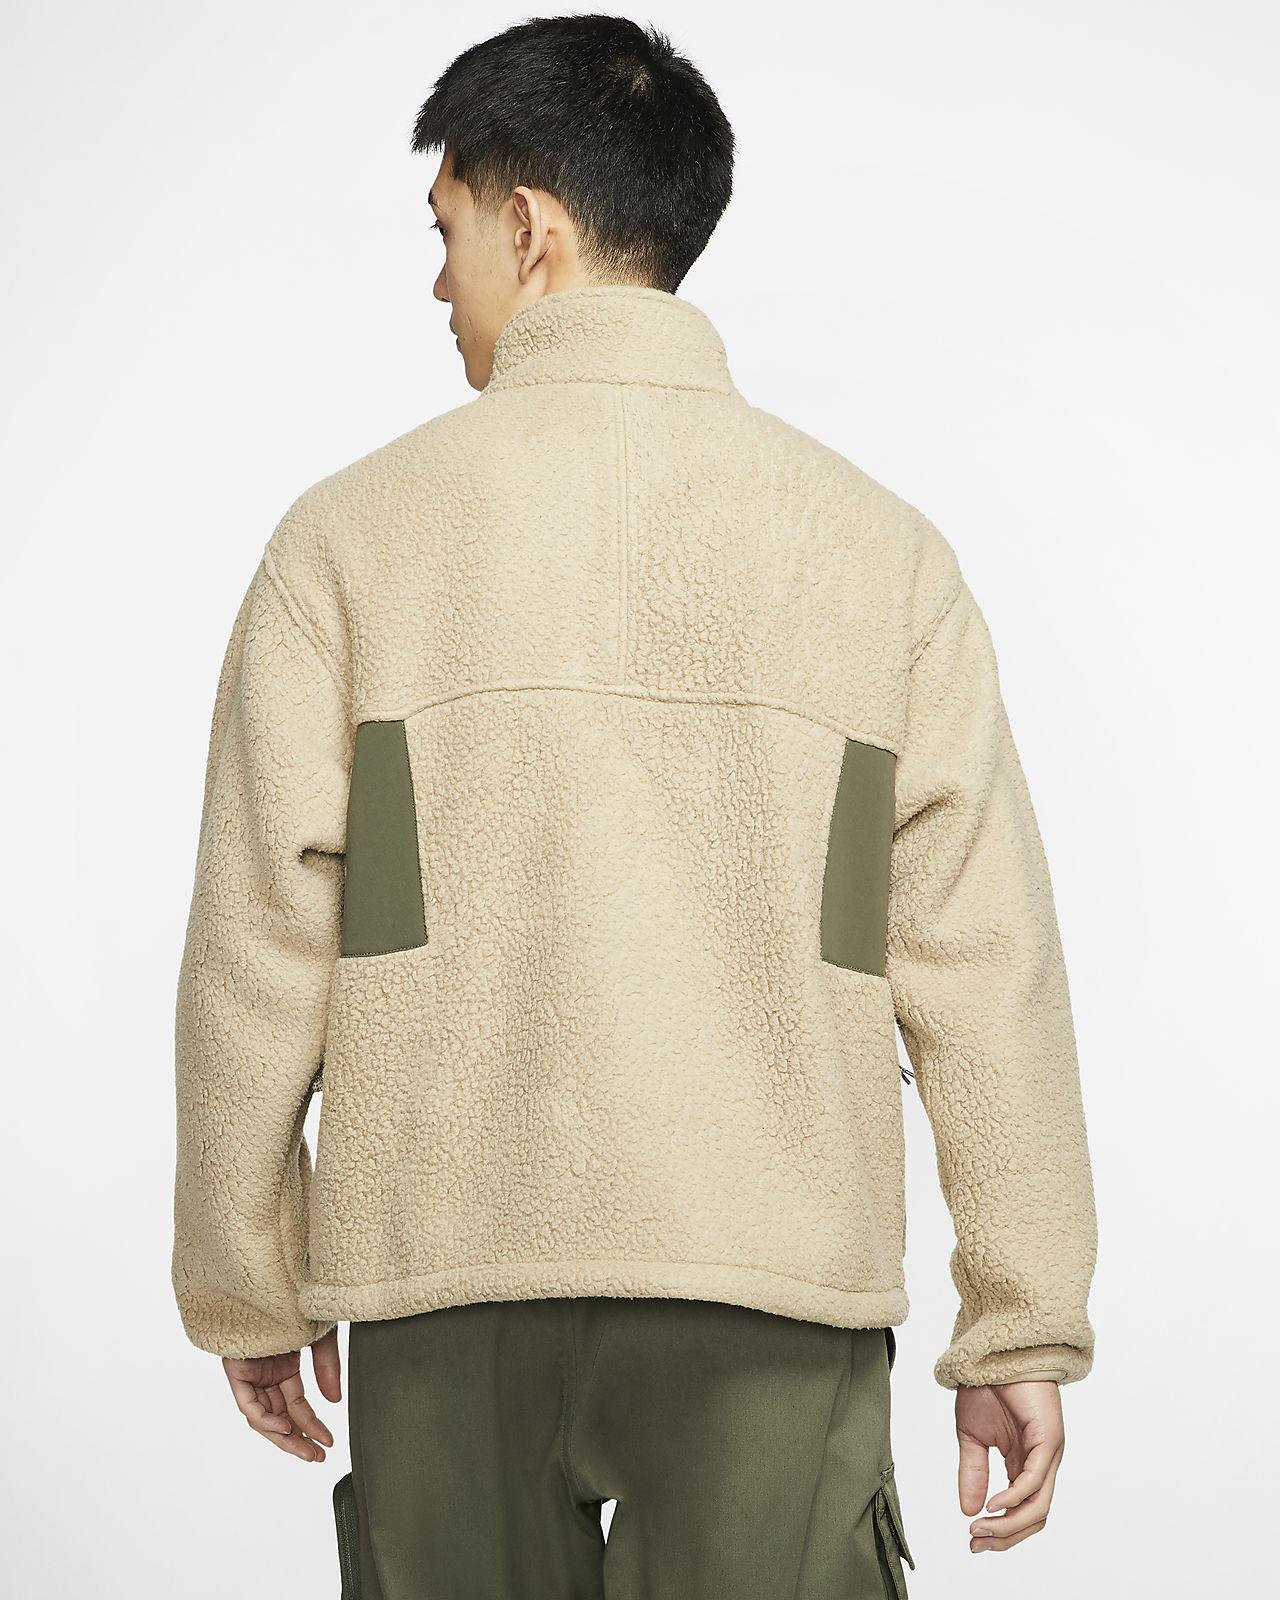 Vintage NIKE ACG All Conditions Gear STORM FIT Jacket Sz L